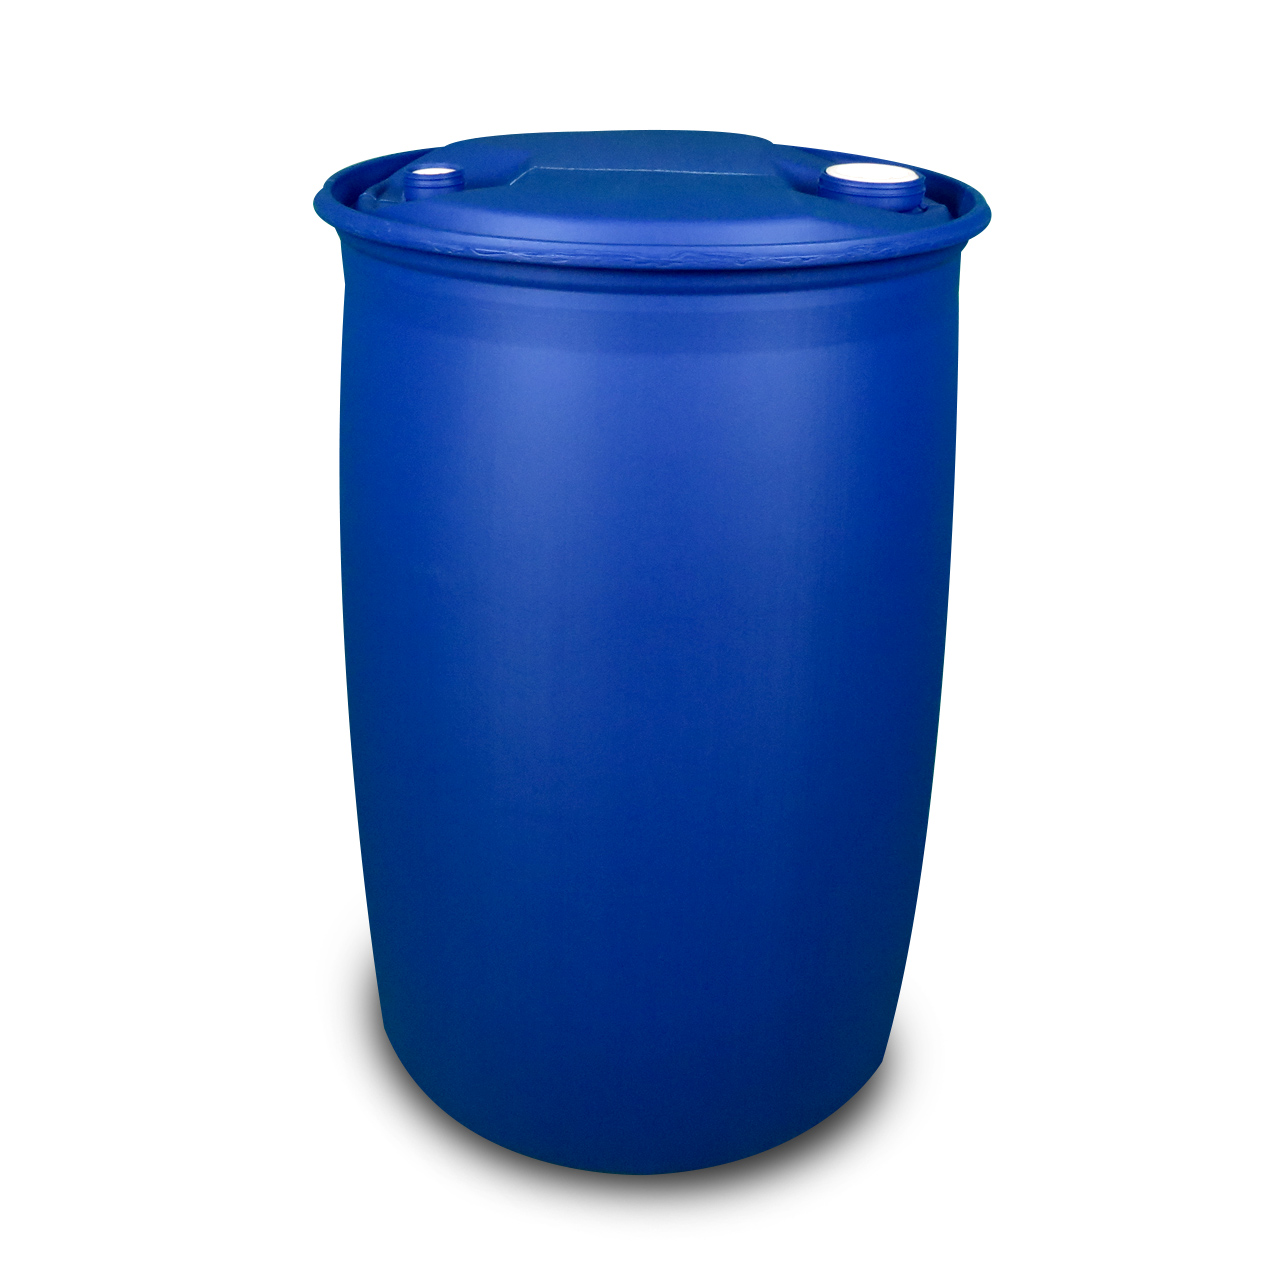 120 L Kunststoffspundfass, L-Ring, UN Gefahrgut - Zulassung